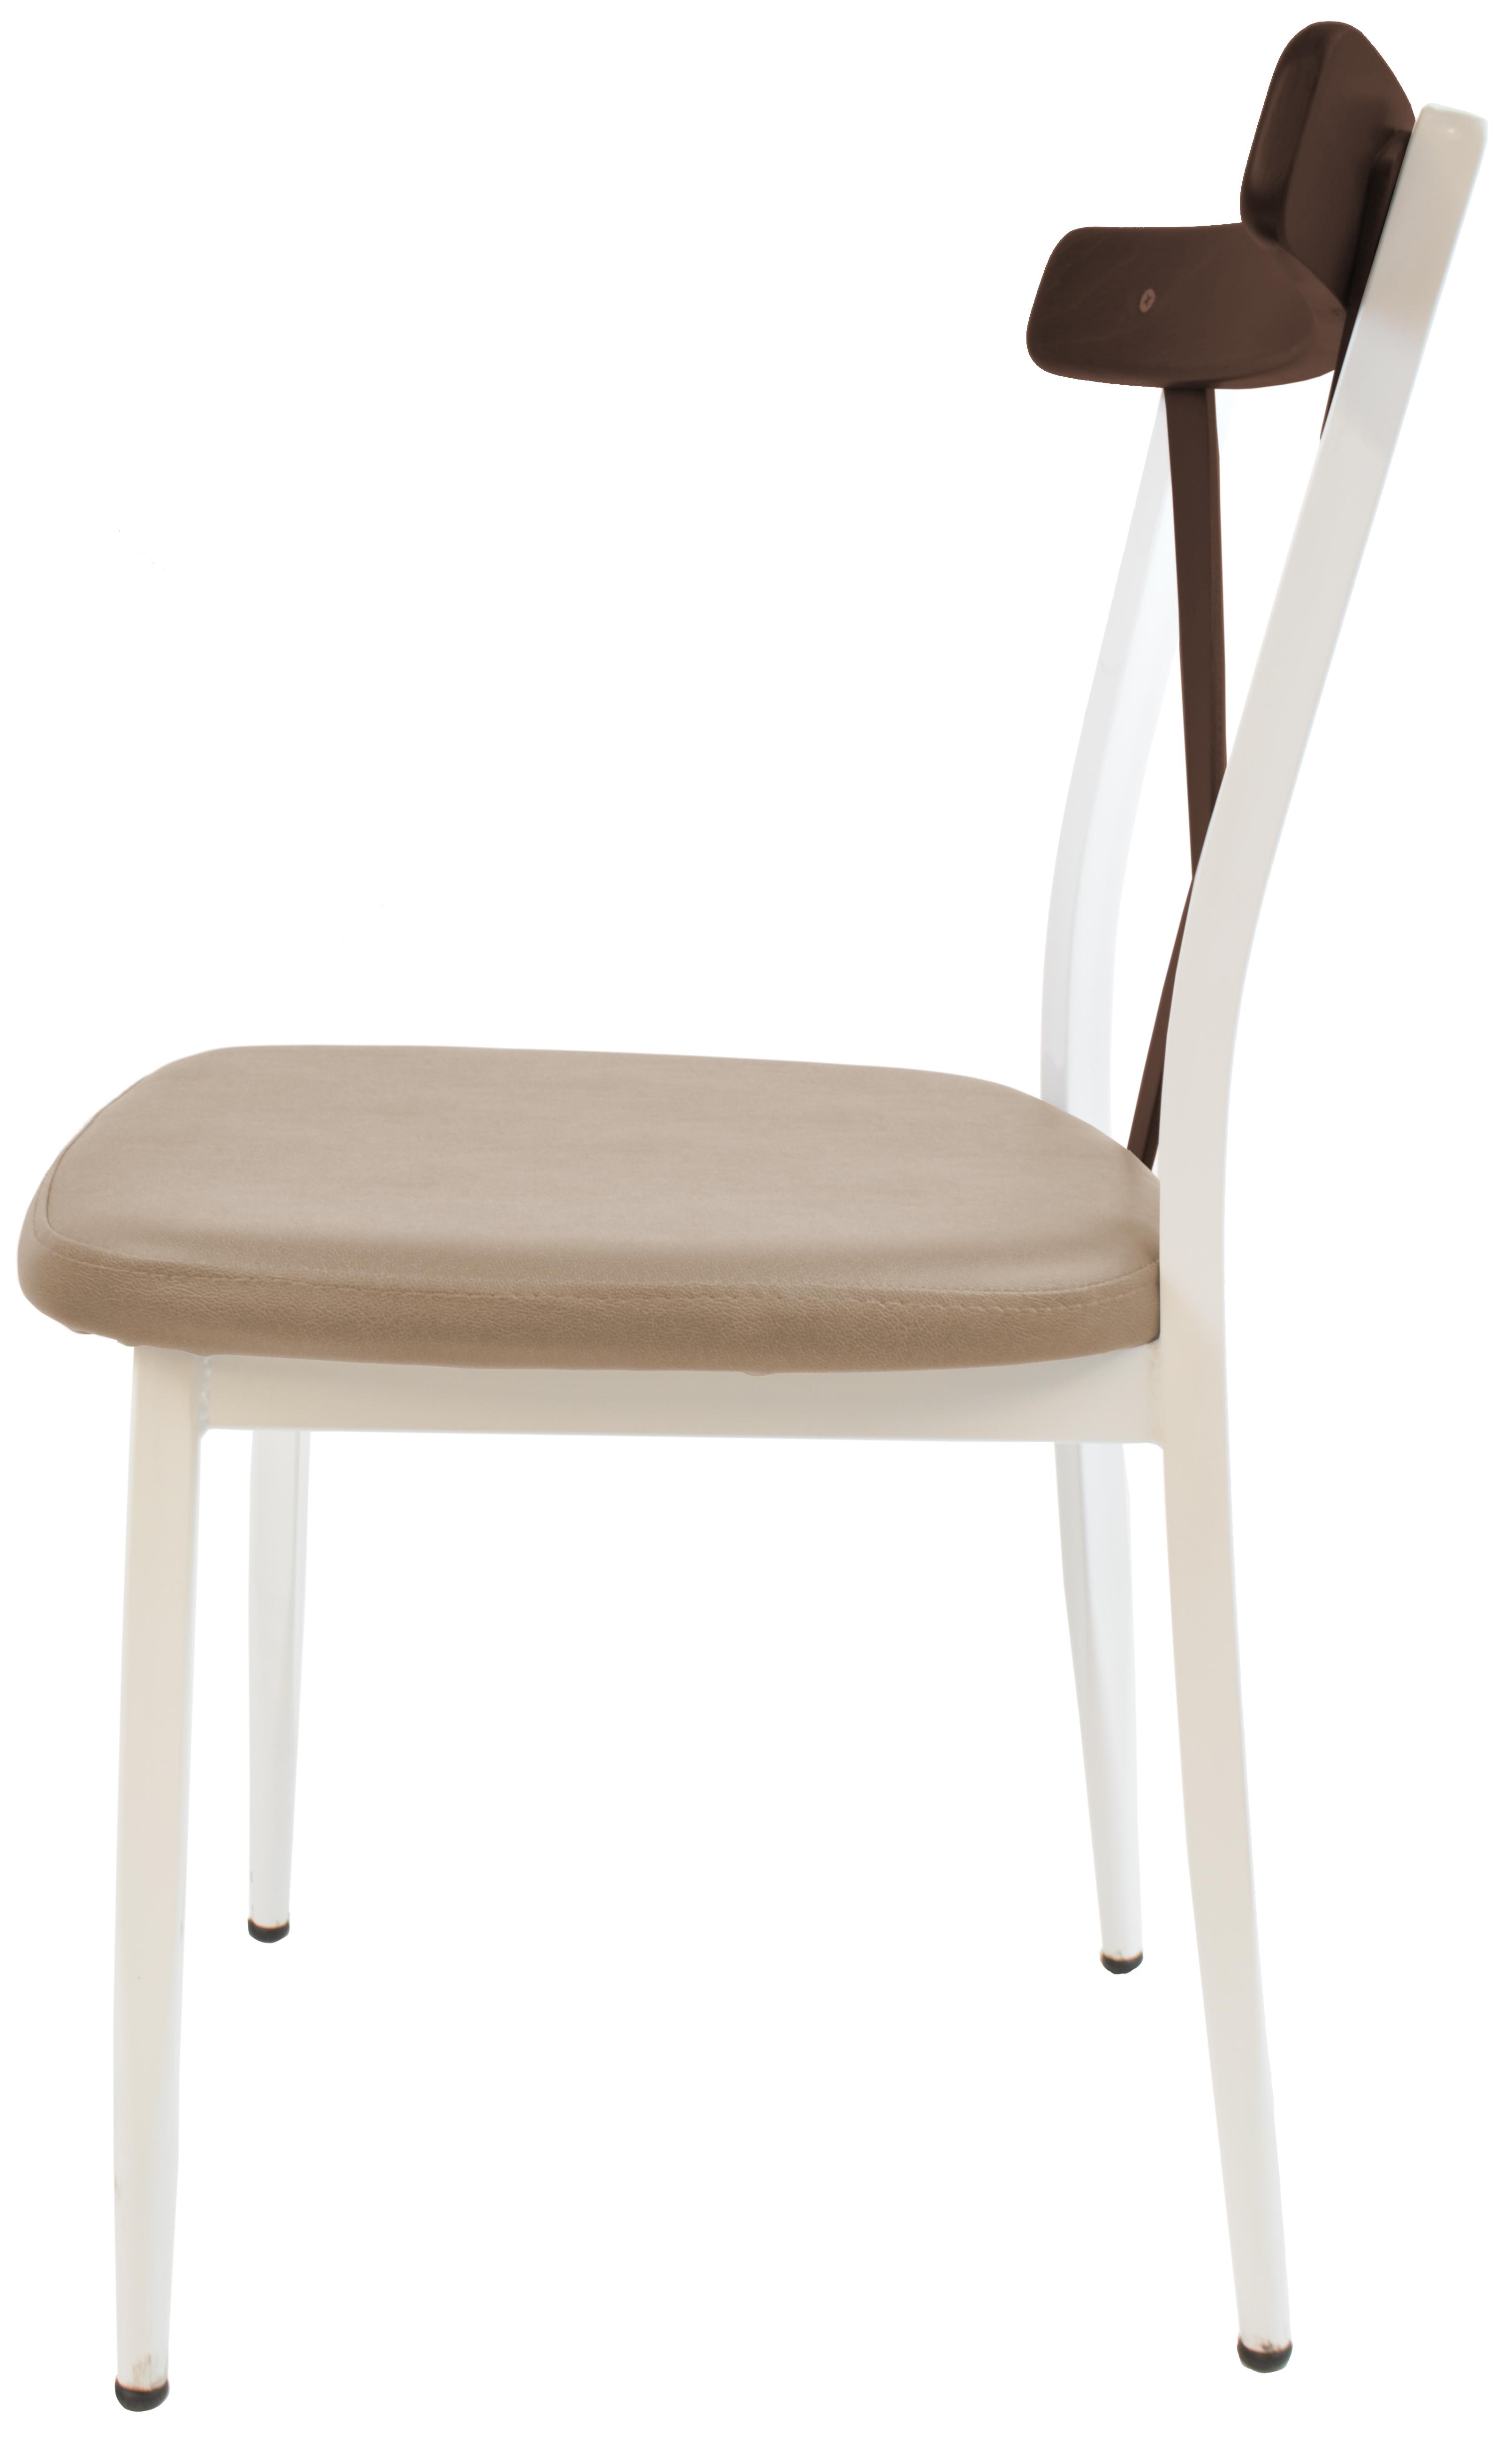 gastronomie cafe stuhl charlie g100 gestell weiss sitz braun m bel star. Black Bedroom Furniture Sets. Home Design Ideas